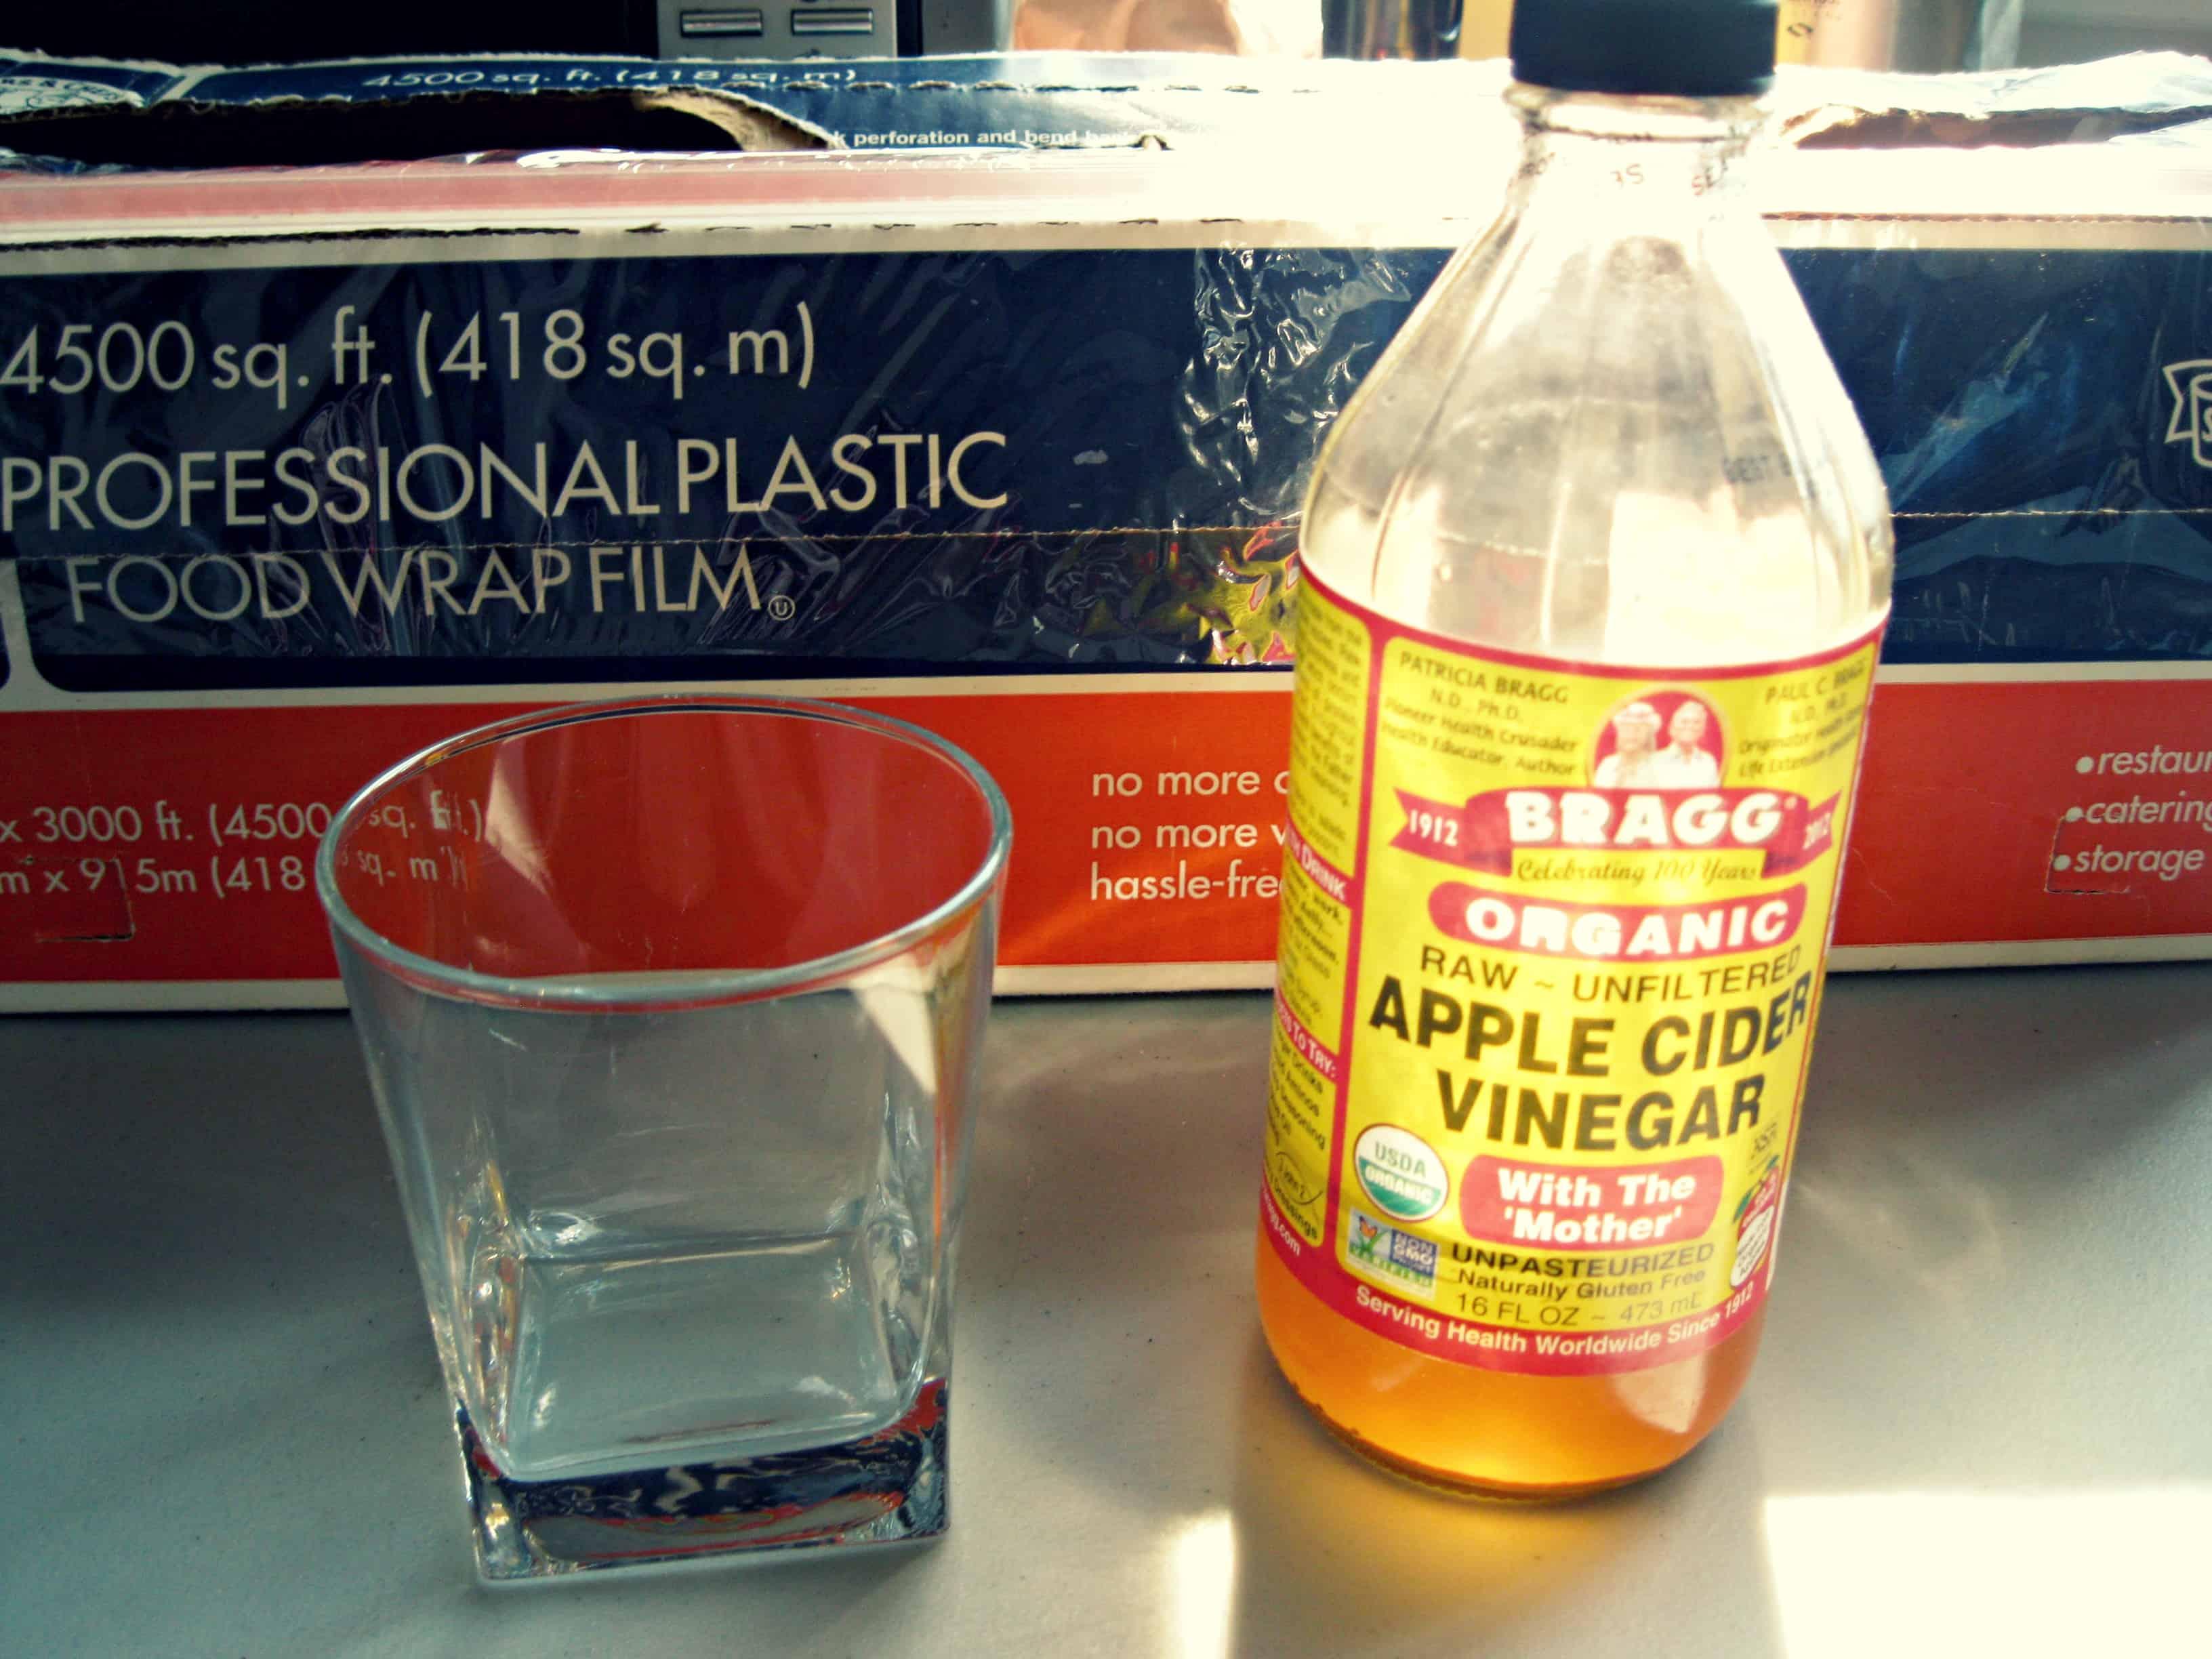 A jar of apple cider vinegar next to an empty glass.